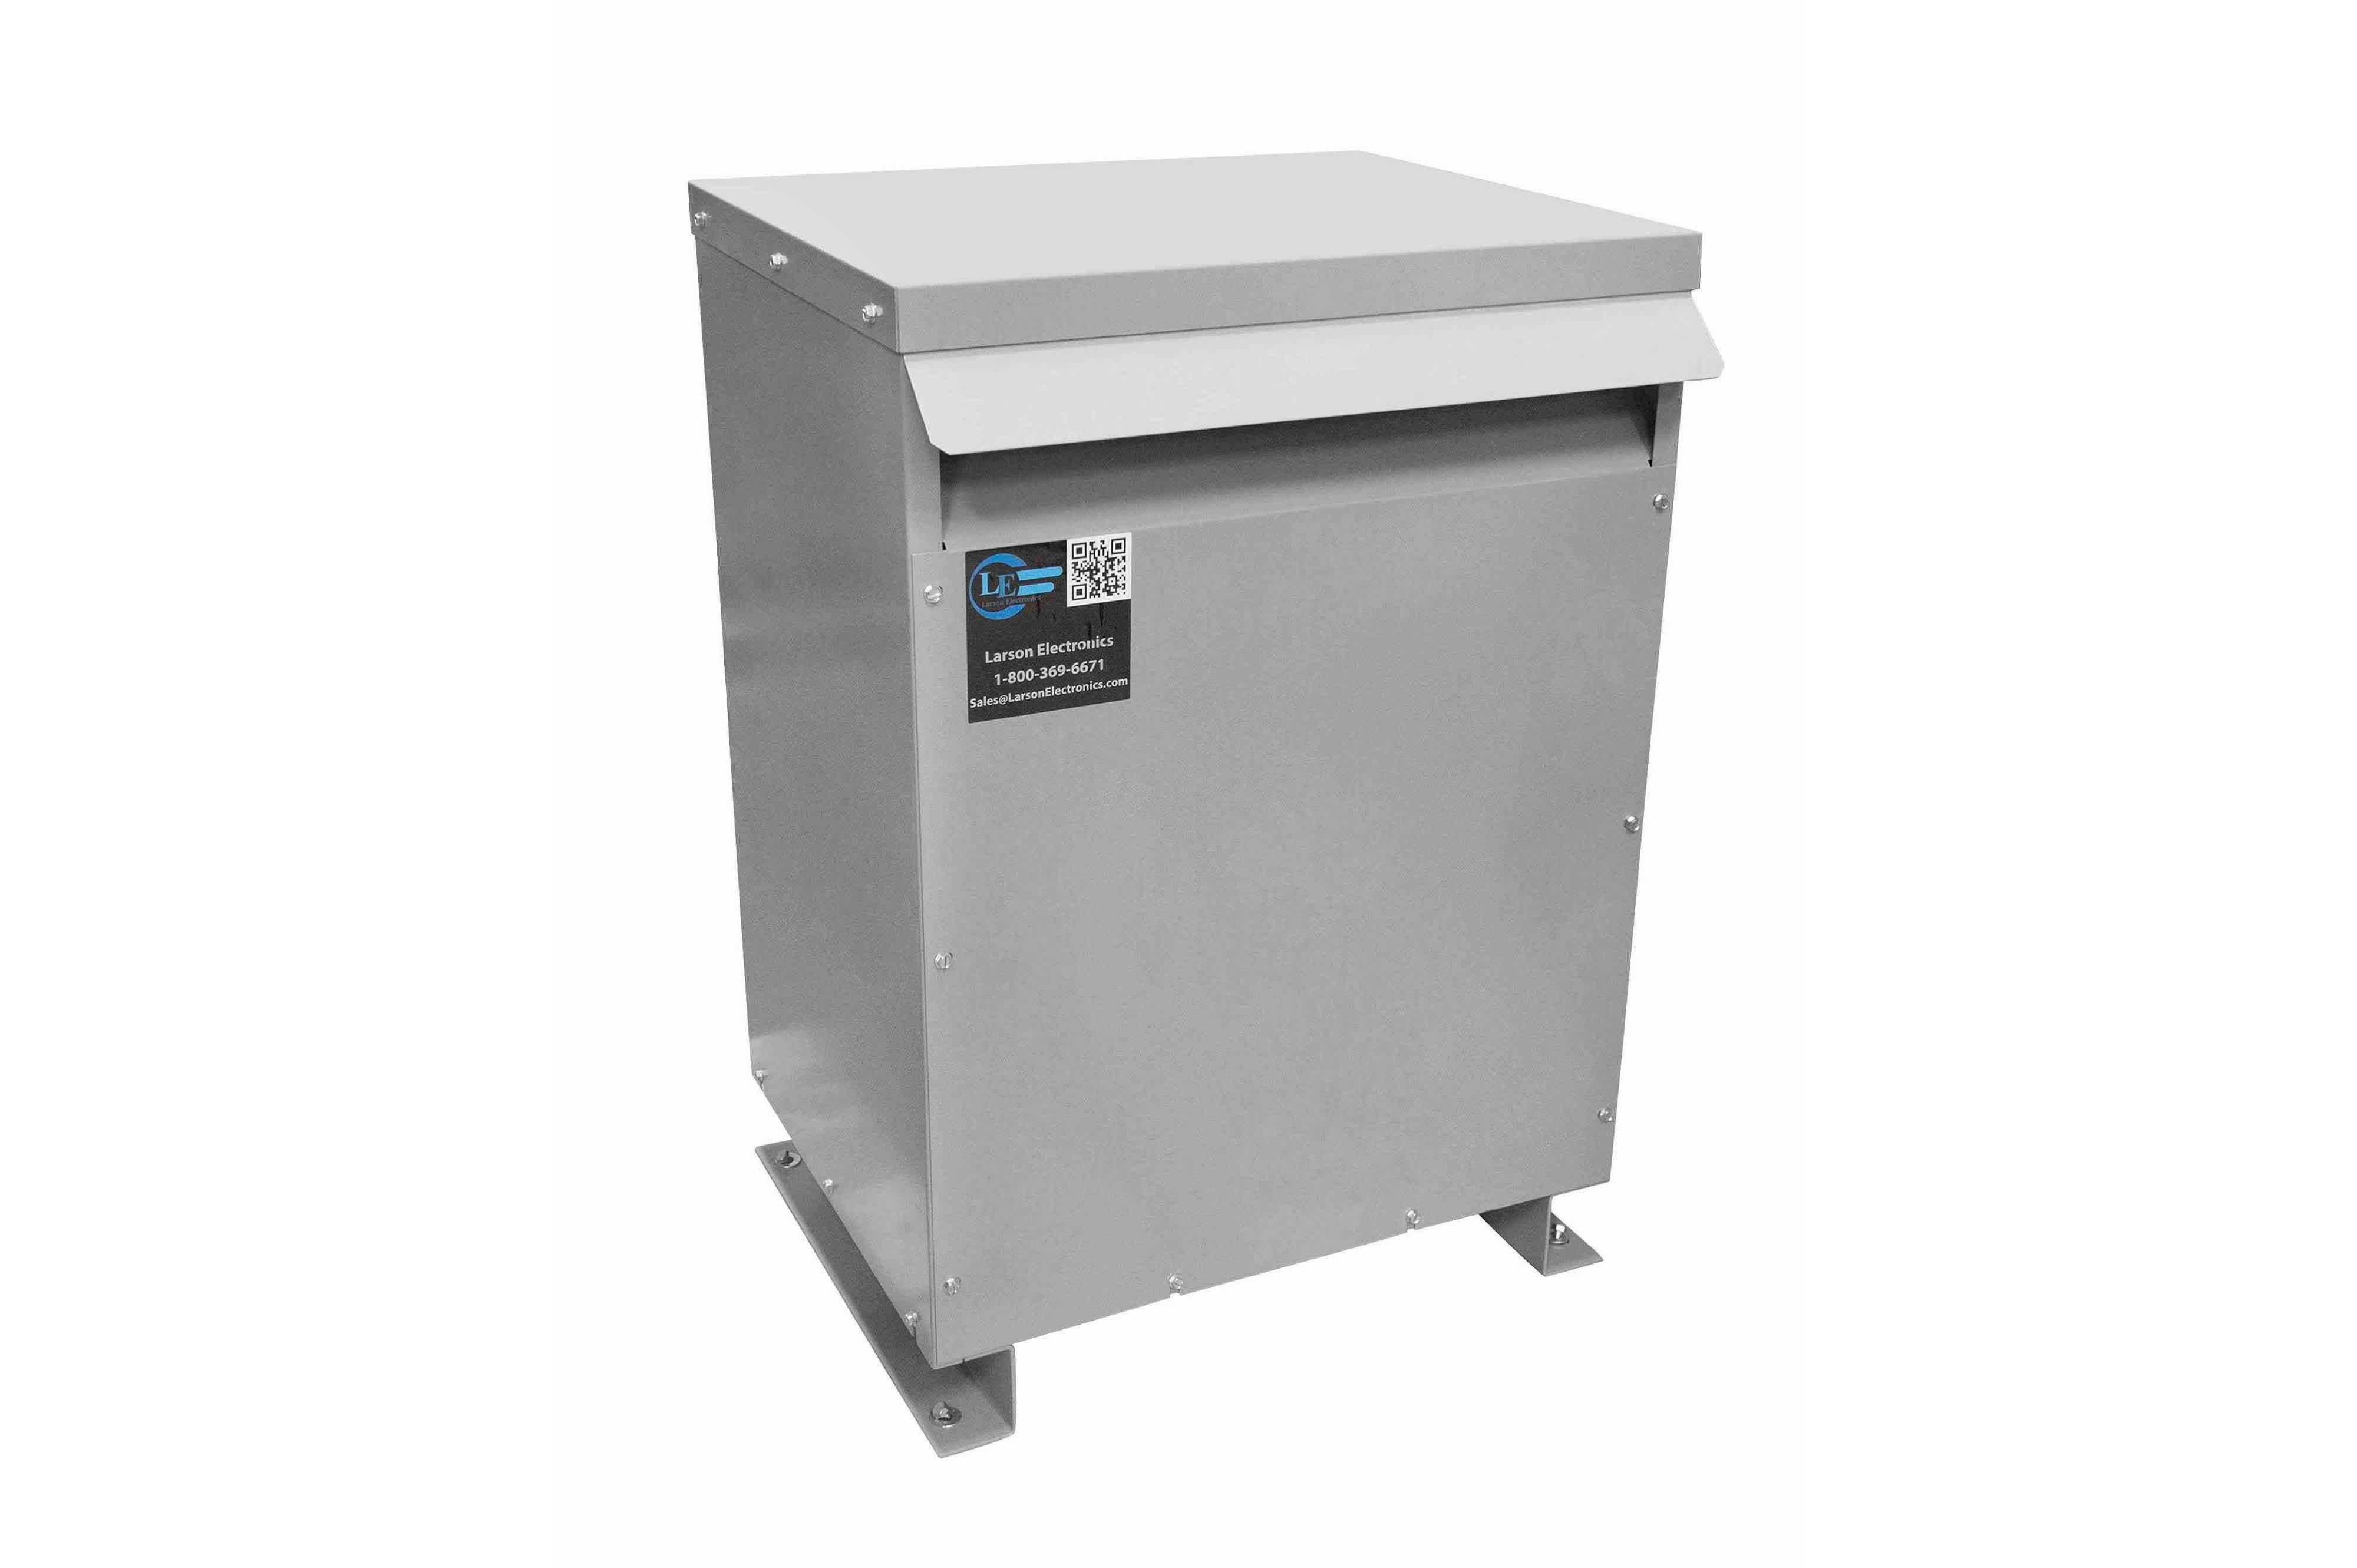 35 kVA 3PH Isolation Transformer, 480V Wye Primary, 380V Delta Secondary, N3R, Ventilated, 60 Hz